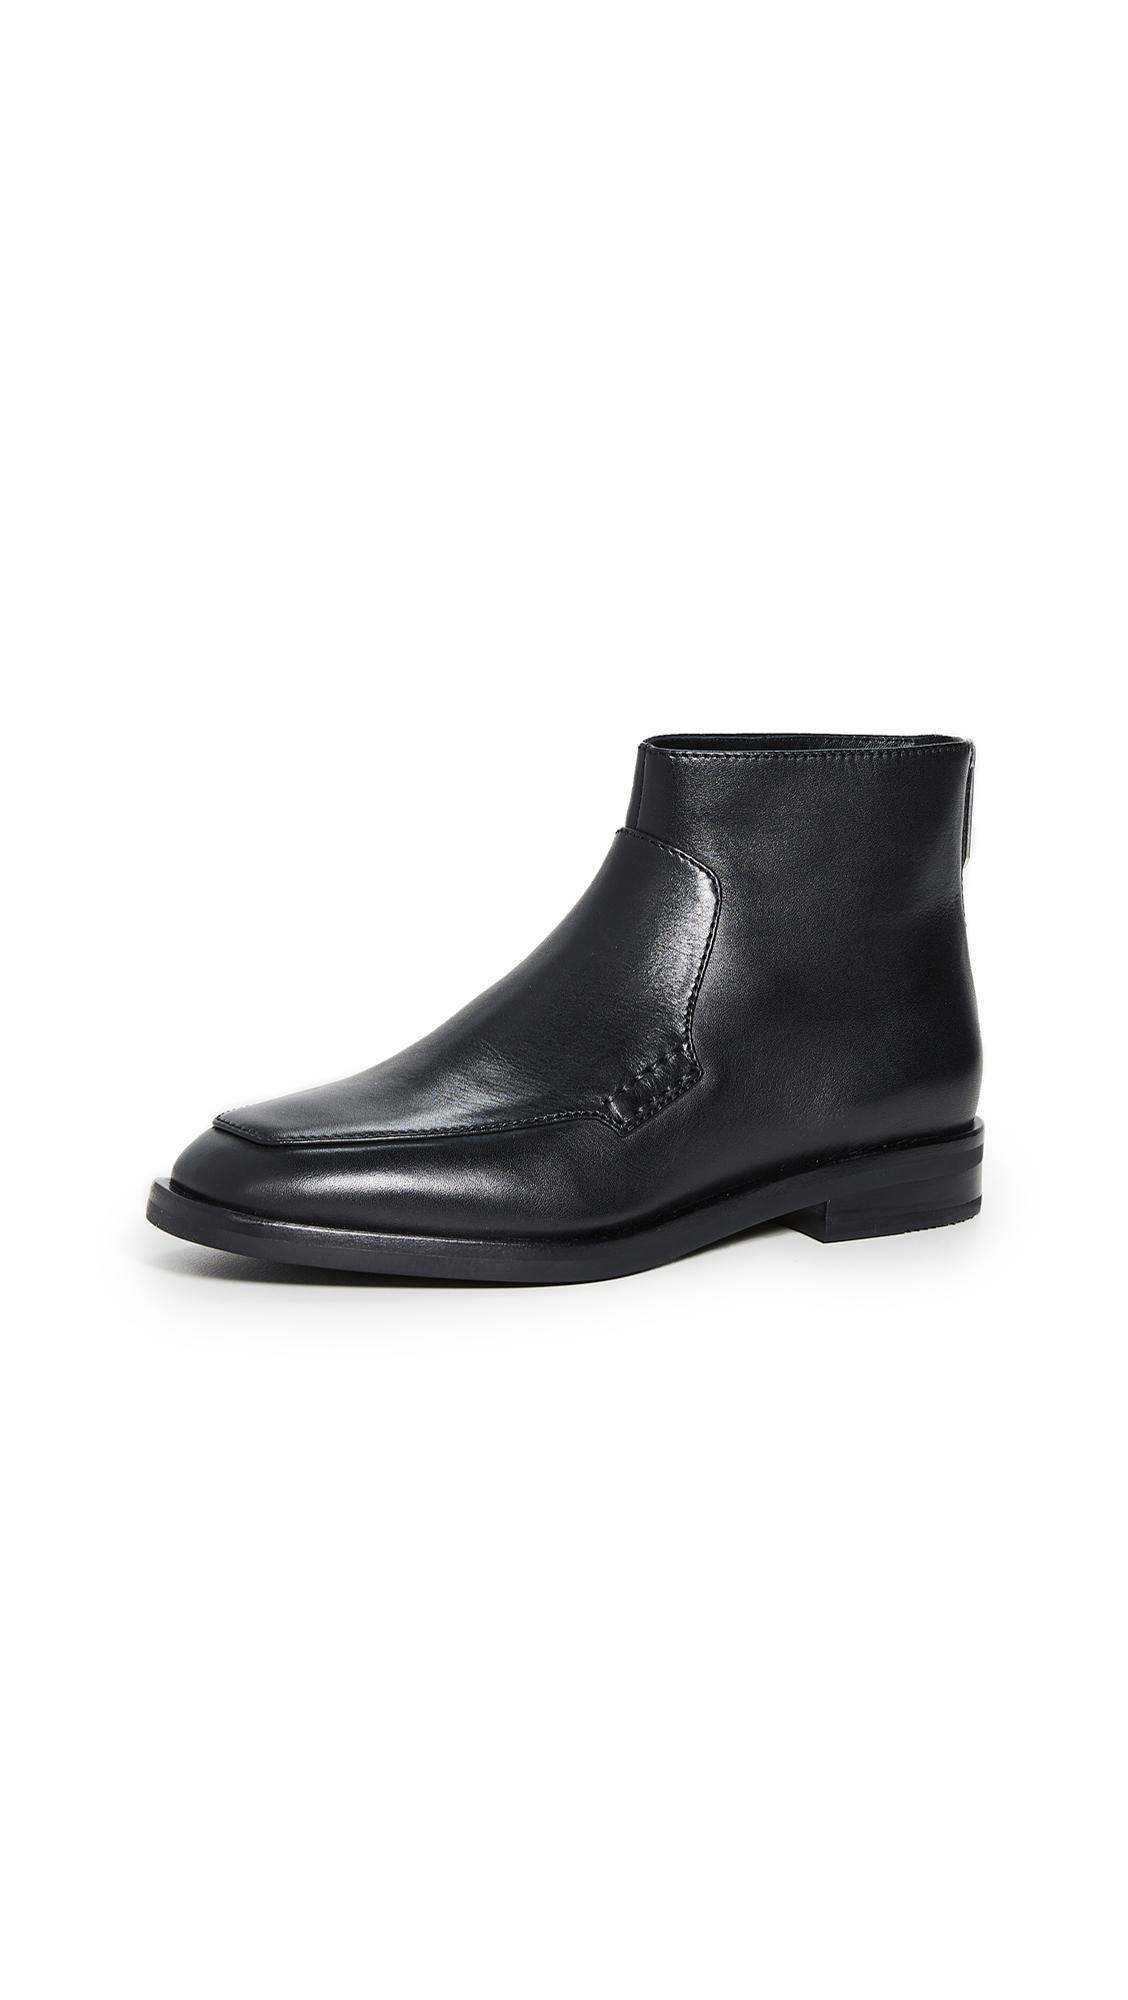 Buy 3.1 Phillip Lim Alexa 25mm Loafer Boots online, shop 3.1 Phillip Lim